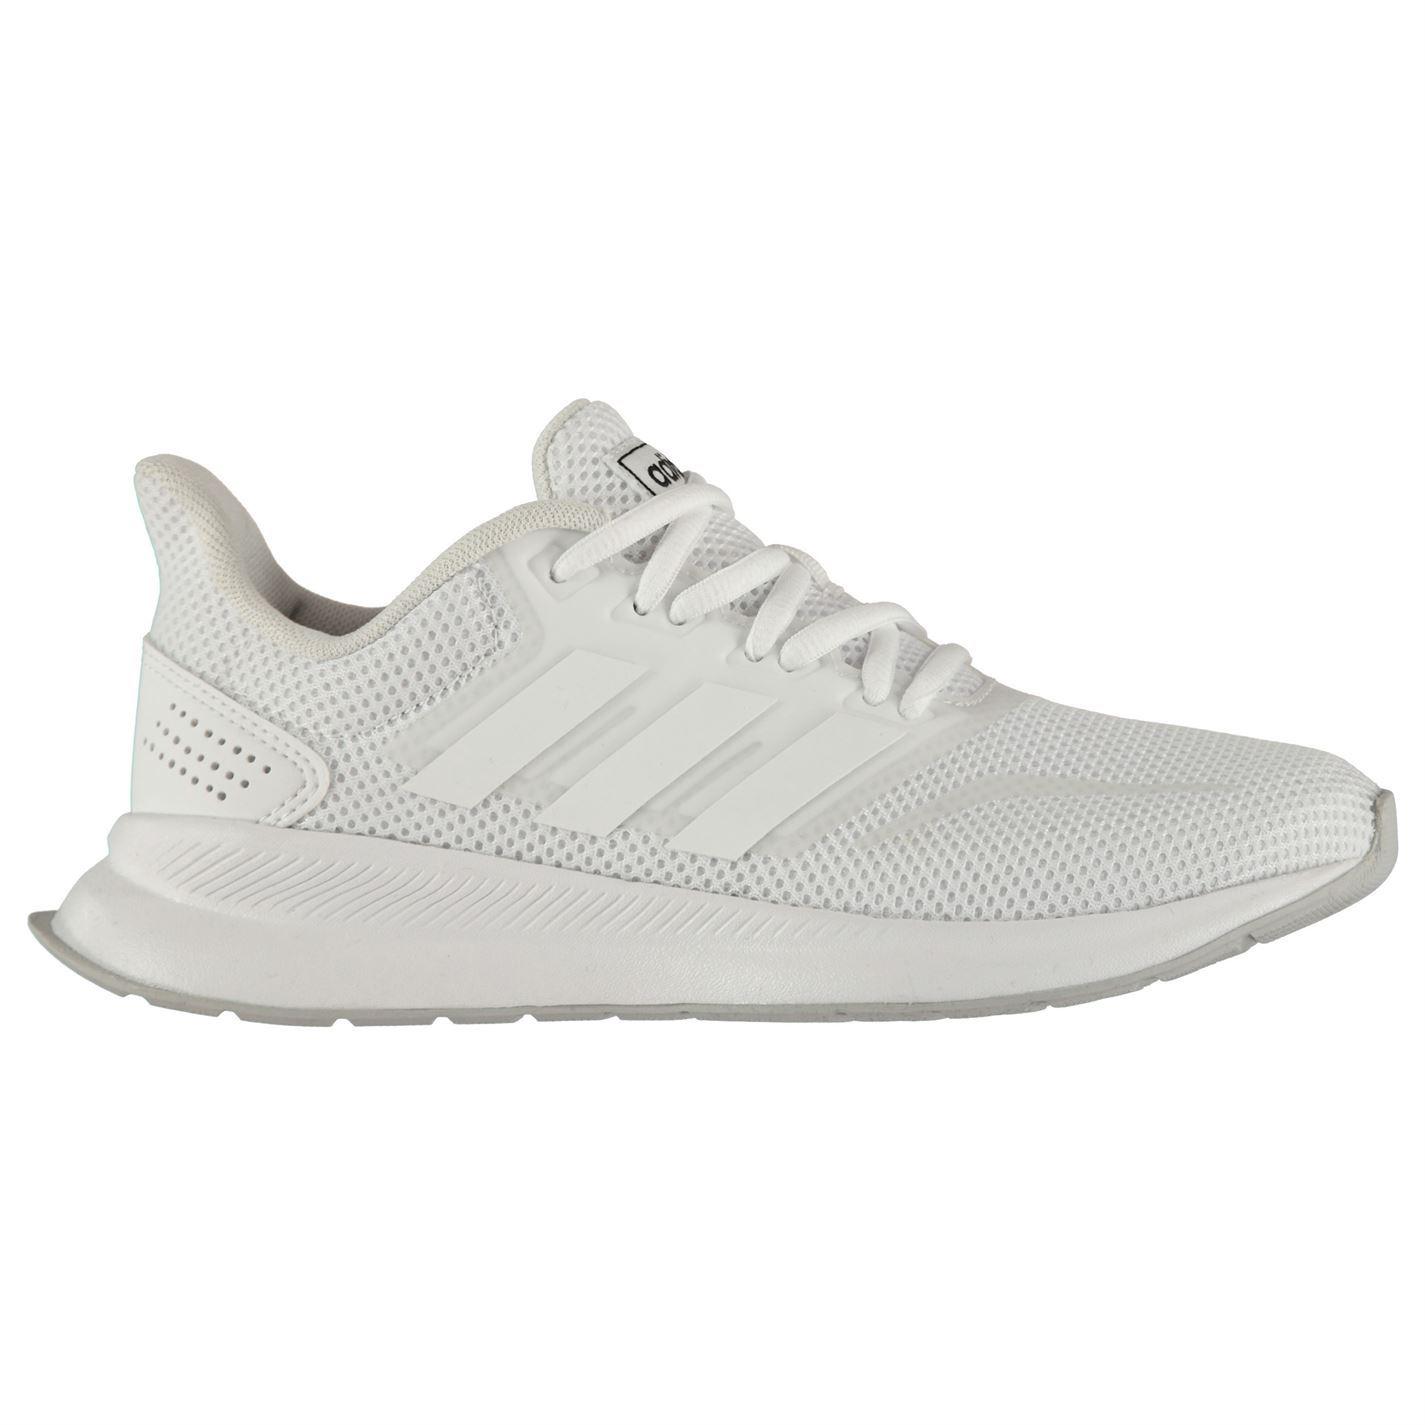 adidas-Falcon-Trainers-Junior-Boys-Shoes-Footwear thumbnail 9